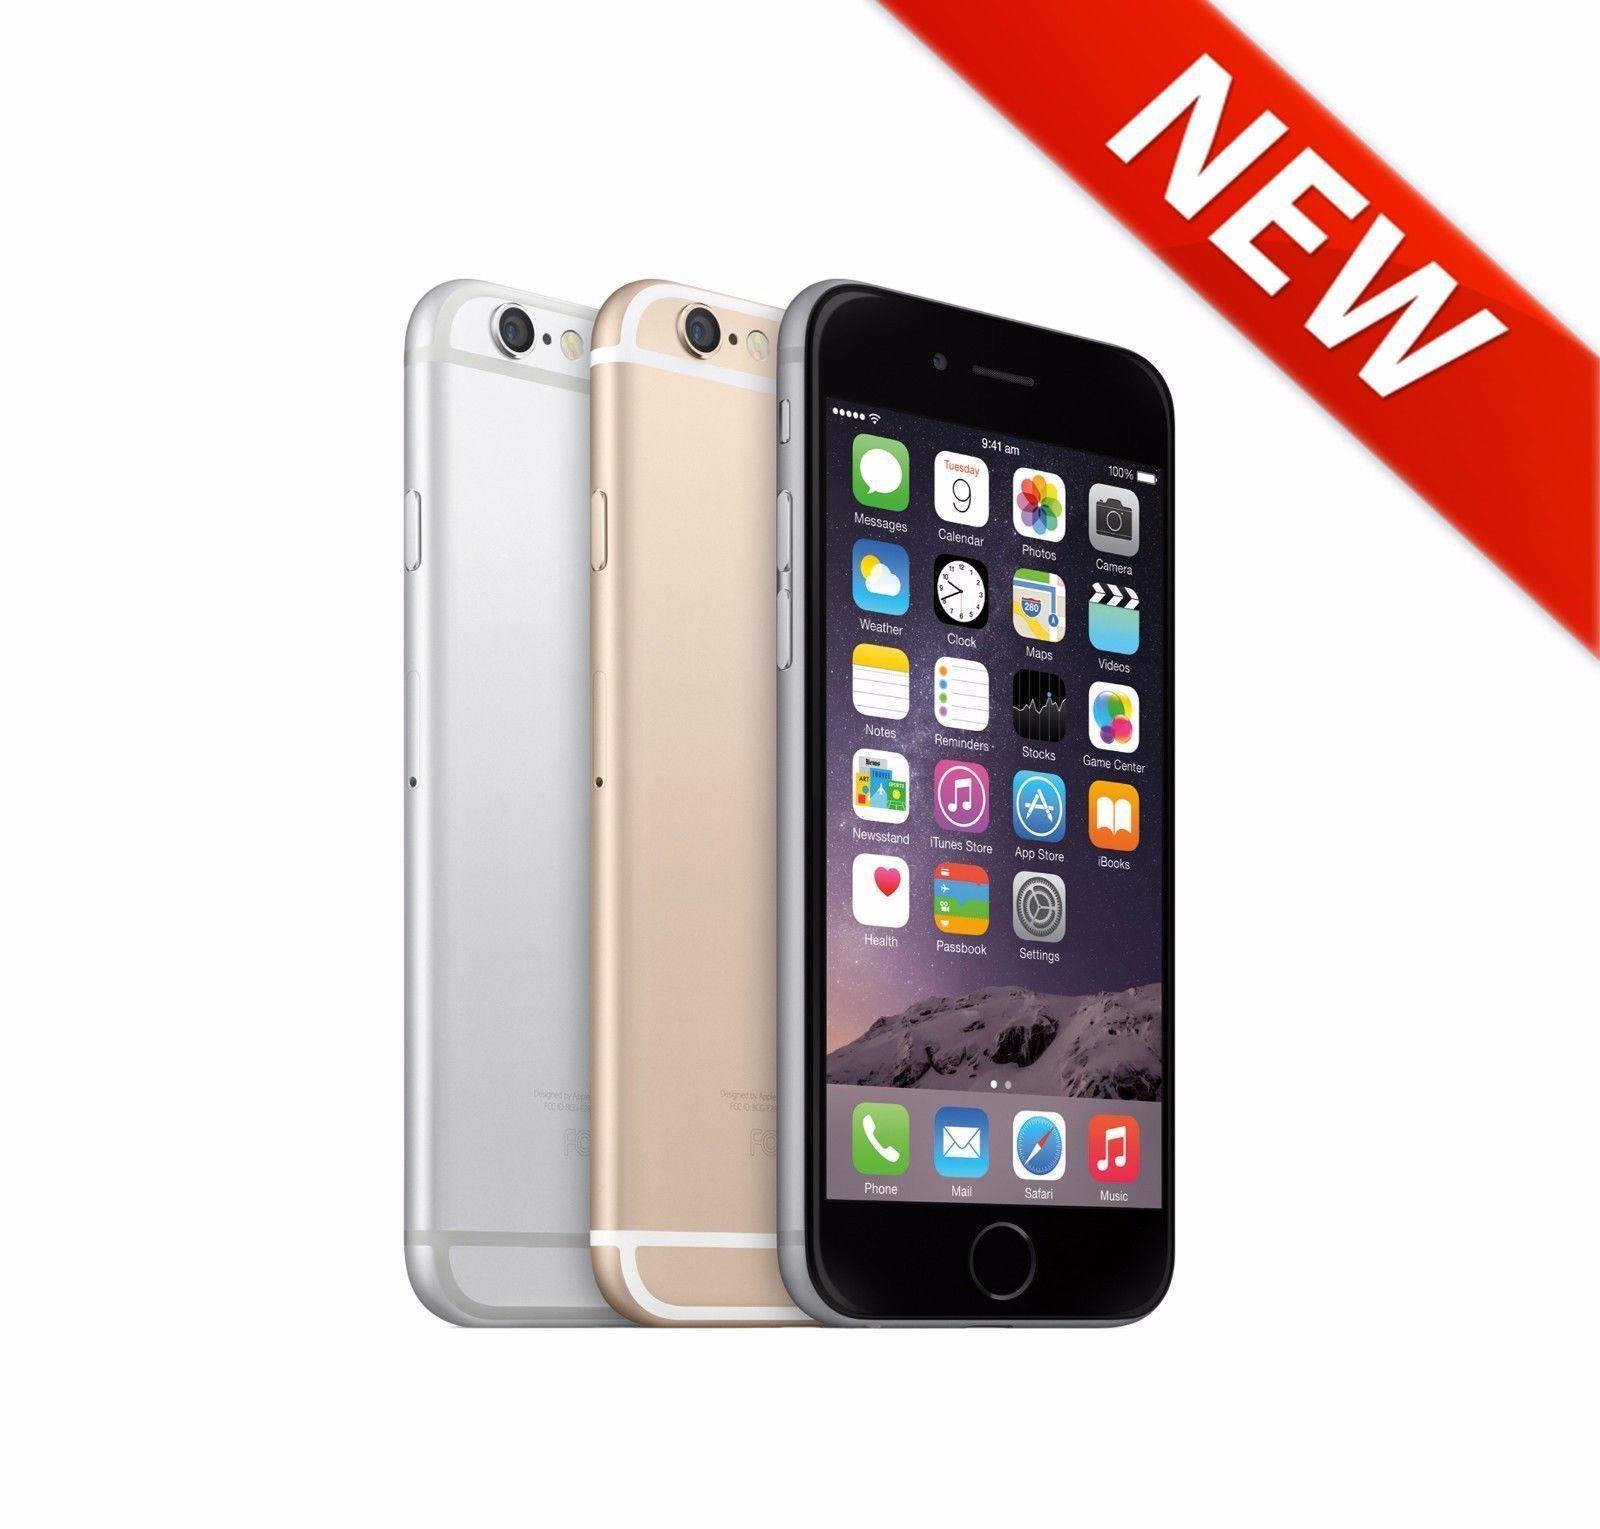 New Apple iphone 6 16GB 64GB 128GB Unlocked 4G LTE Gold Silver Grey Smartphone